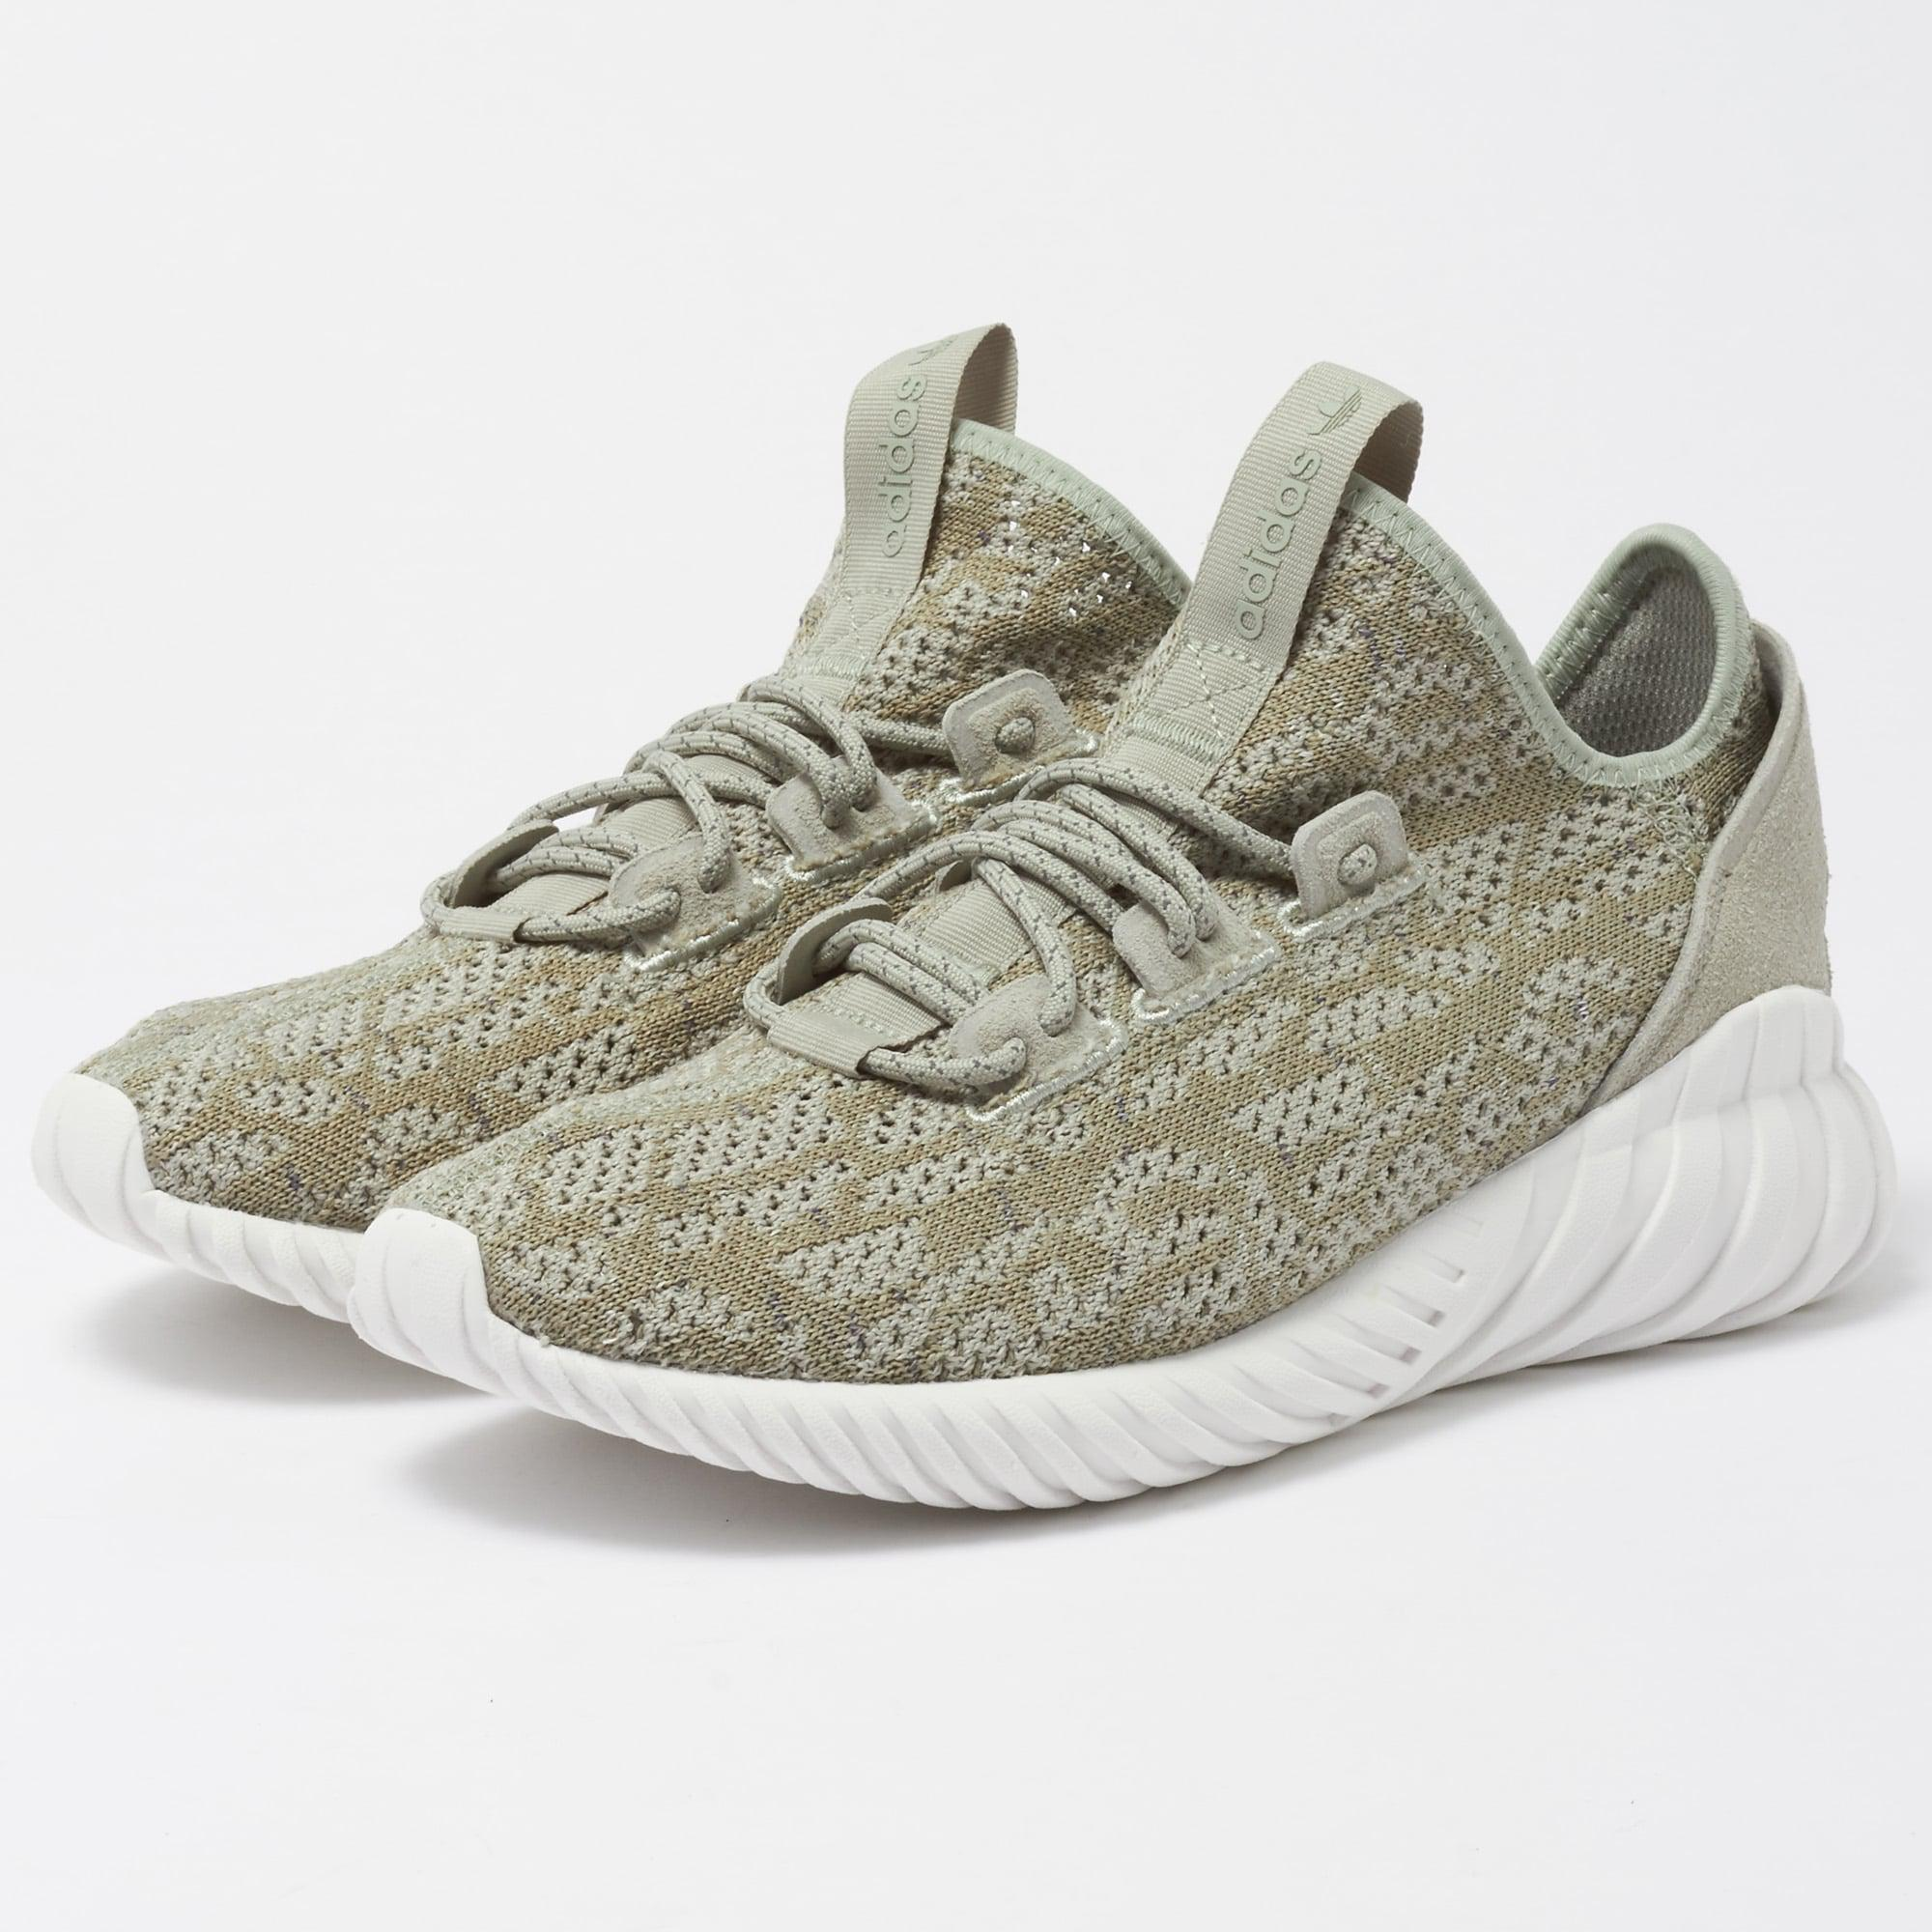 TUBULAR DOOM SOCK PK - FOOTWEAR - Low-tops & sneakers adidas Hyoj1hPr7L